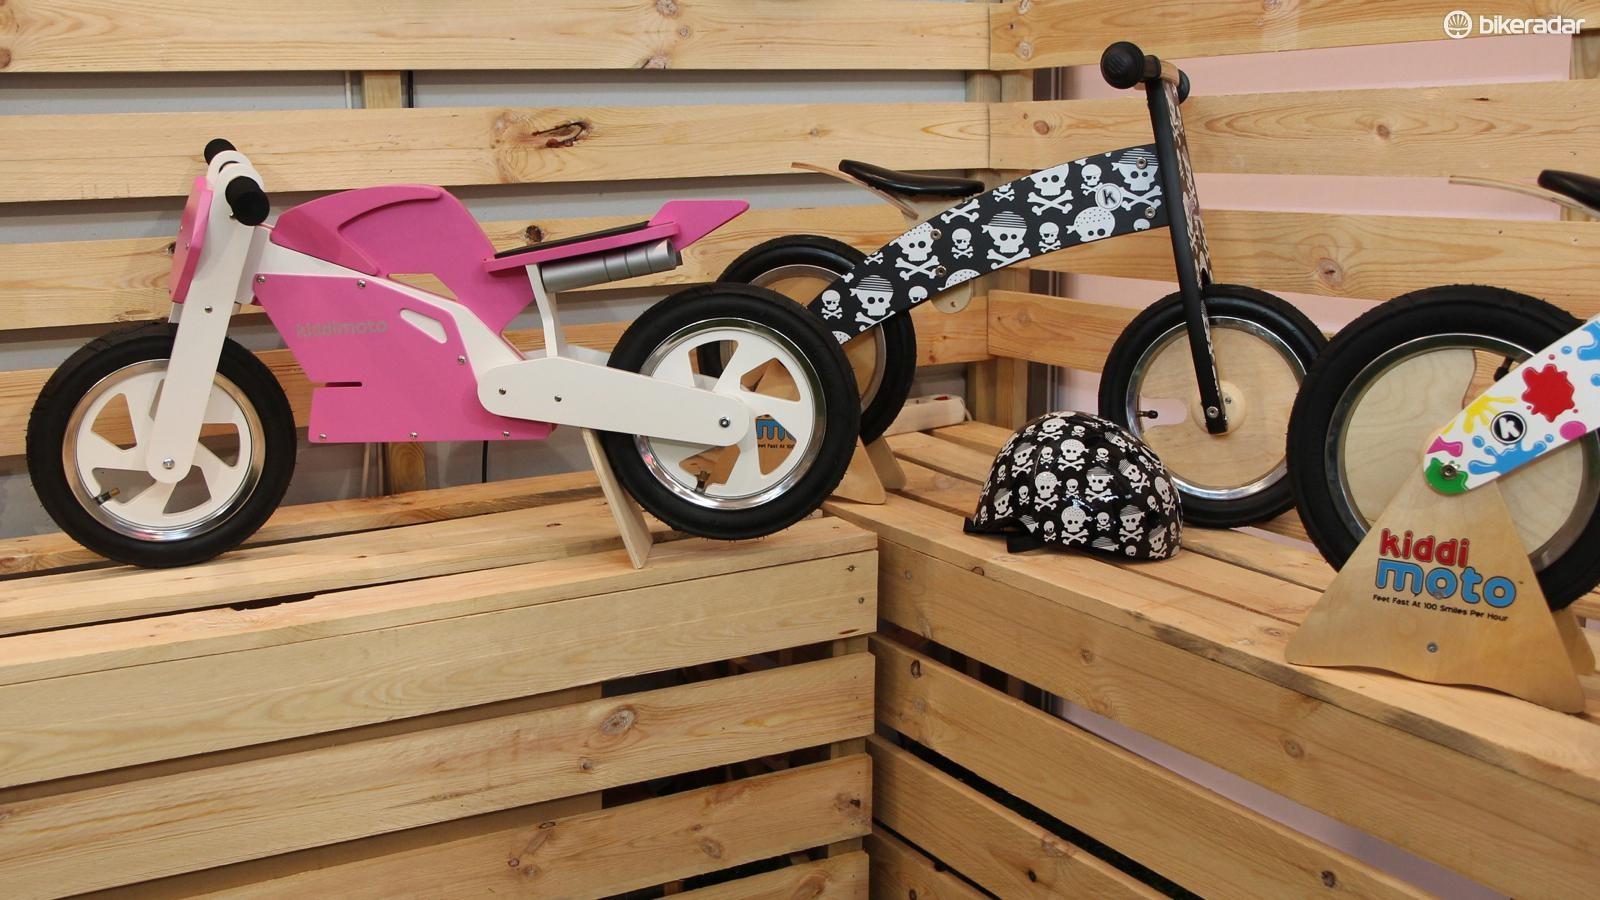 Kiddi Moto has a huge variety of kick bikes